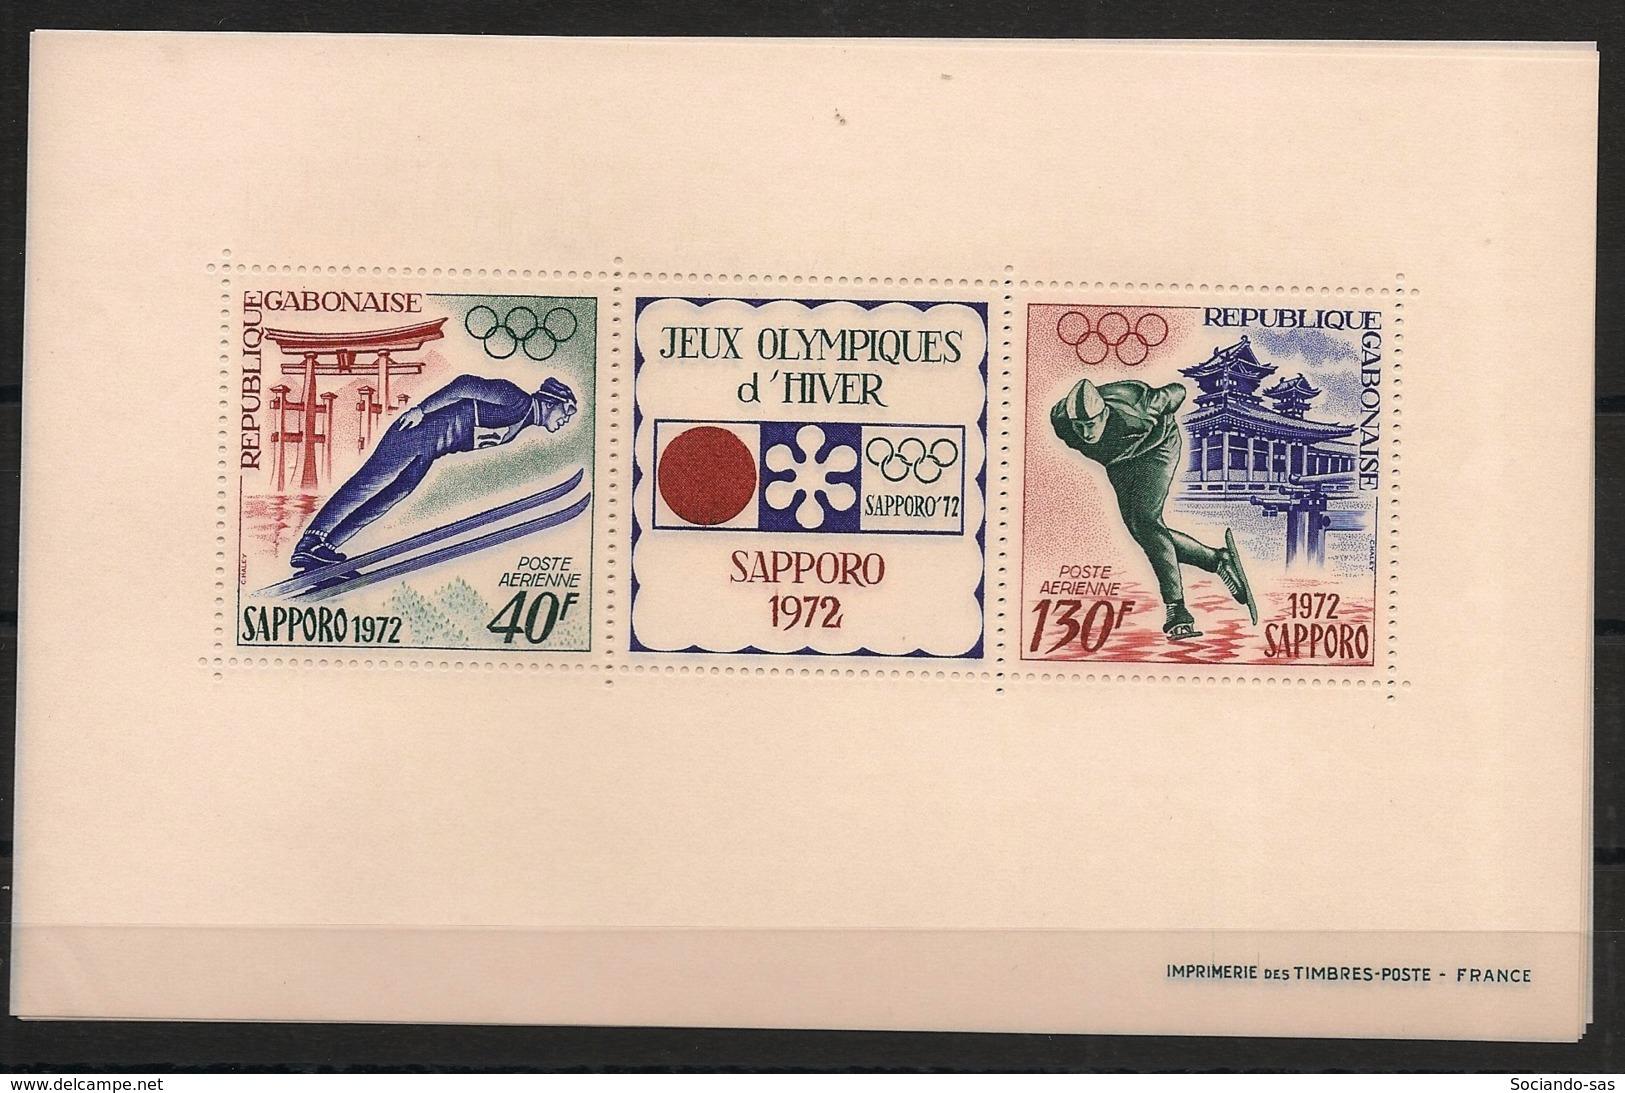 Gabon - 1972 - Bloc Feuillet BF N°Yv. 19 - Olympics / Sapporo - Neuf Luxe ** / MNH / Postfrisch - Gabun (1960-...)